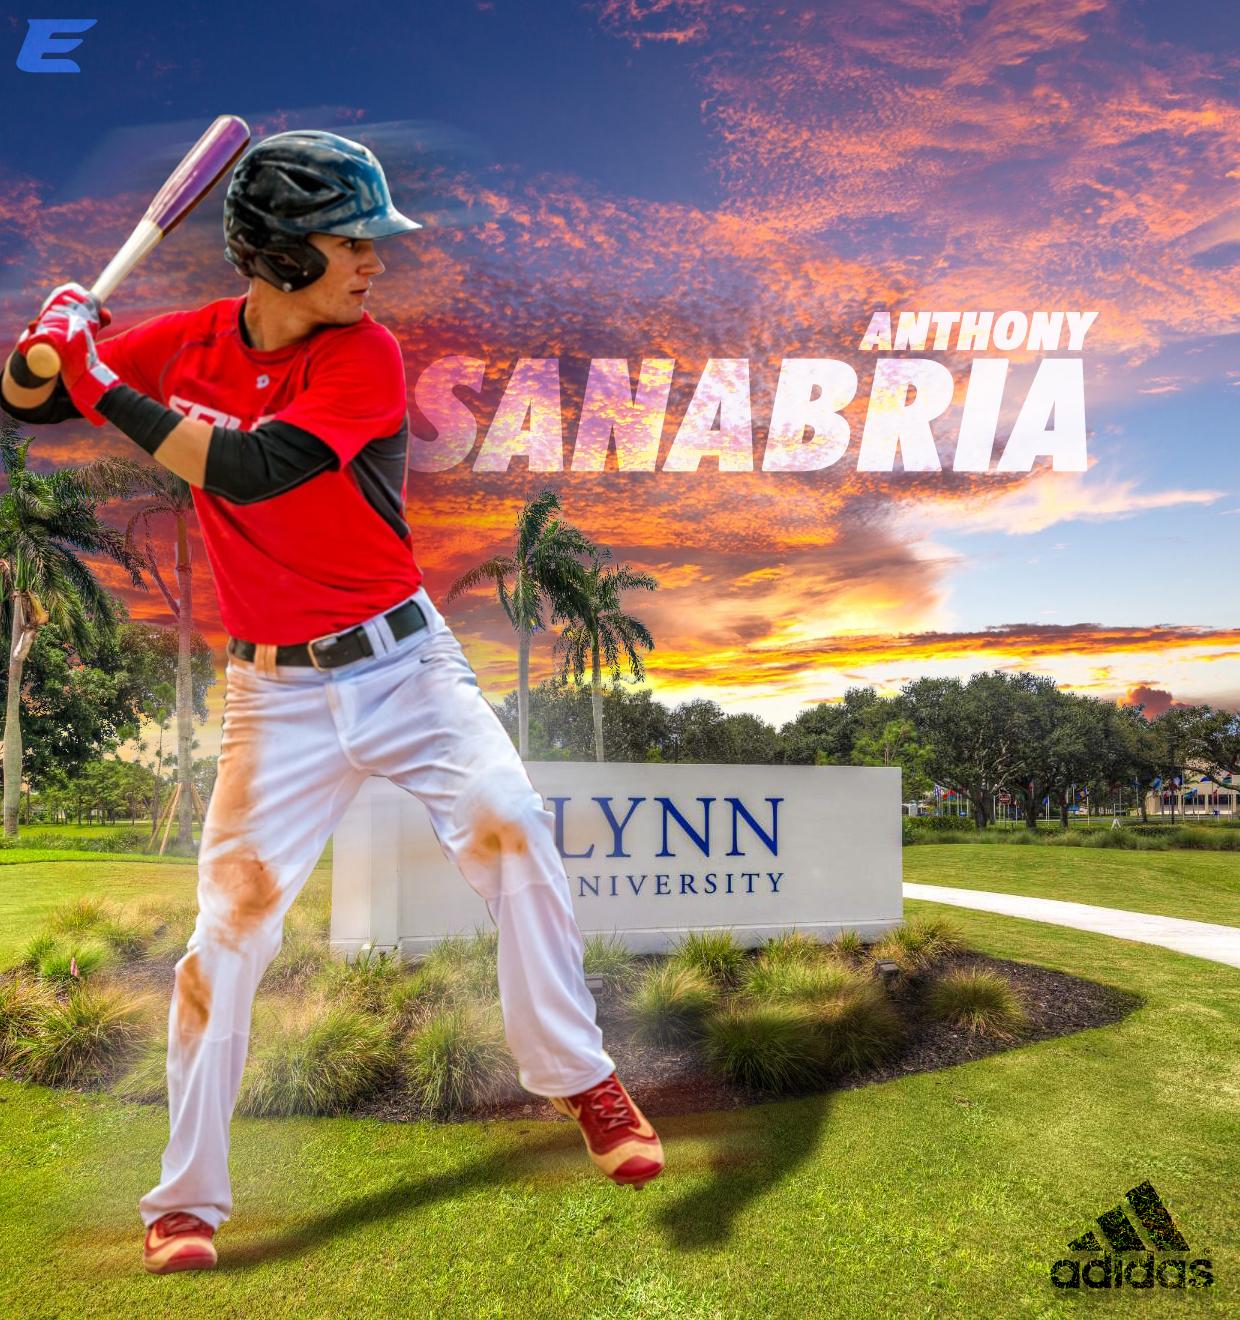 Anthony-Sanabria